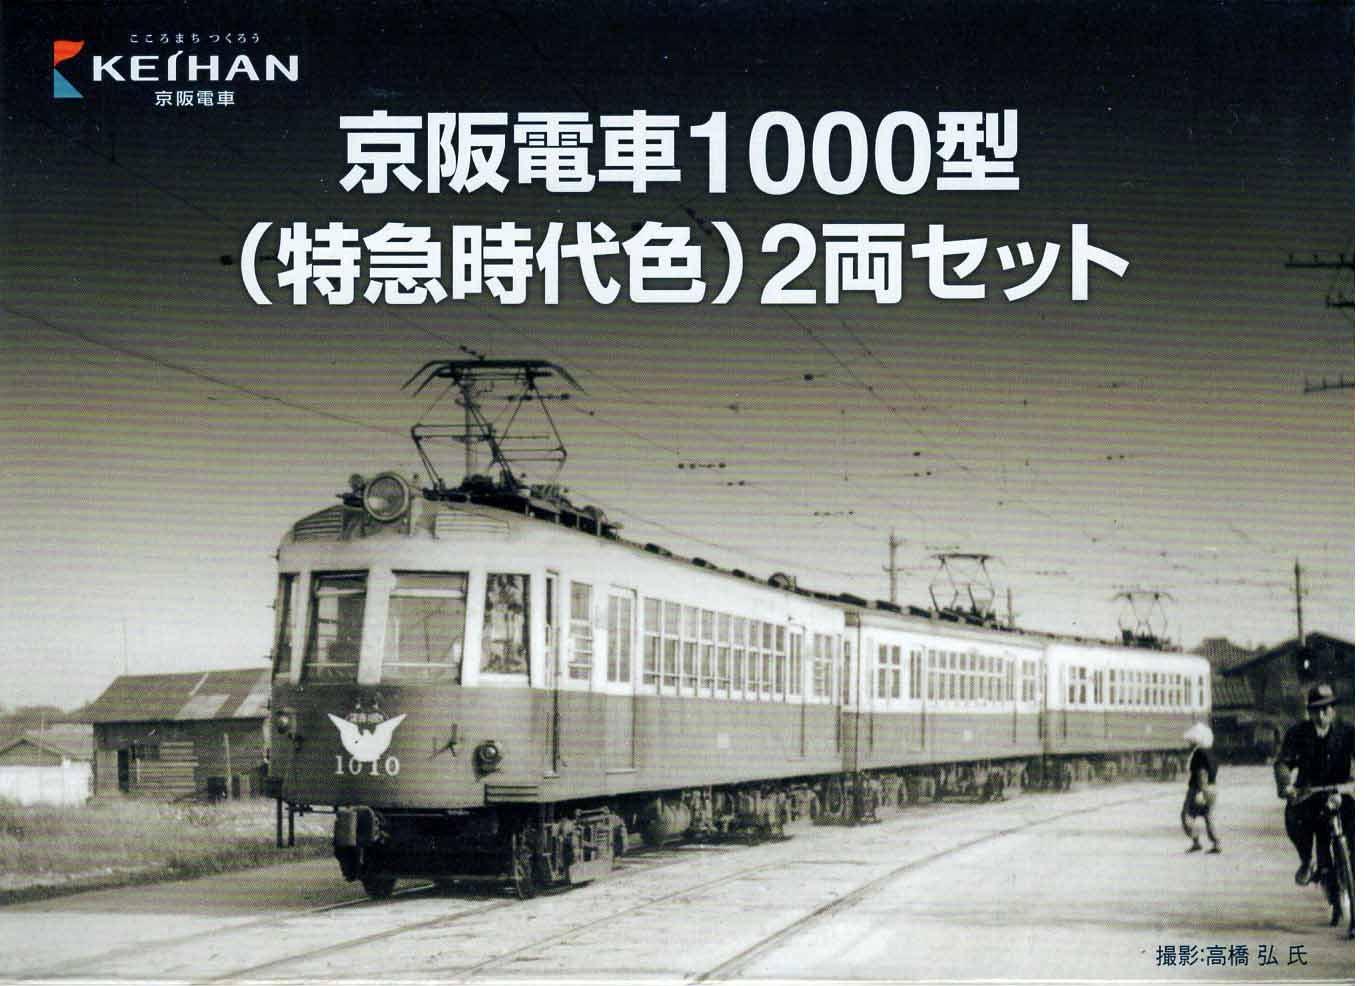 [Limited] Eisenbahn Sammlung Eisen Colle Keihan 1000 Typ express aera Farbe 2-Car Set [Keihan 1000 Express]